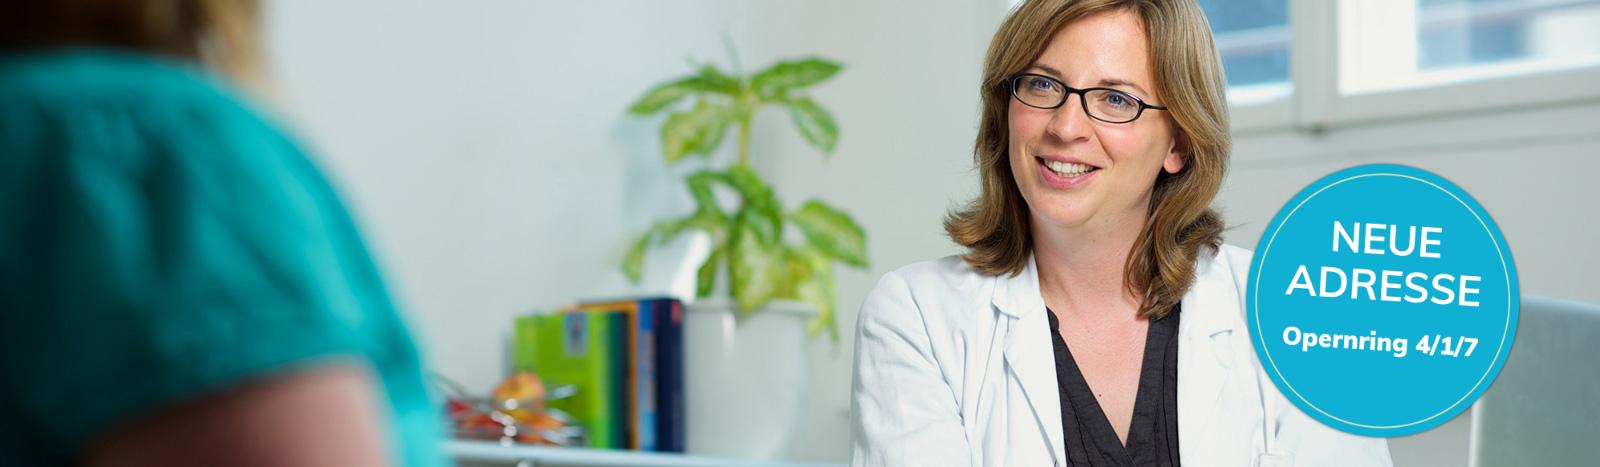 Dr. Julia Lämmerhirt, Hautärztin & Akne-Spezialistin